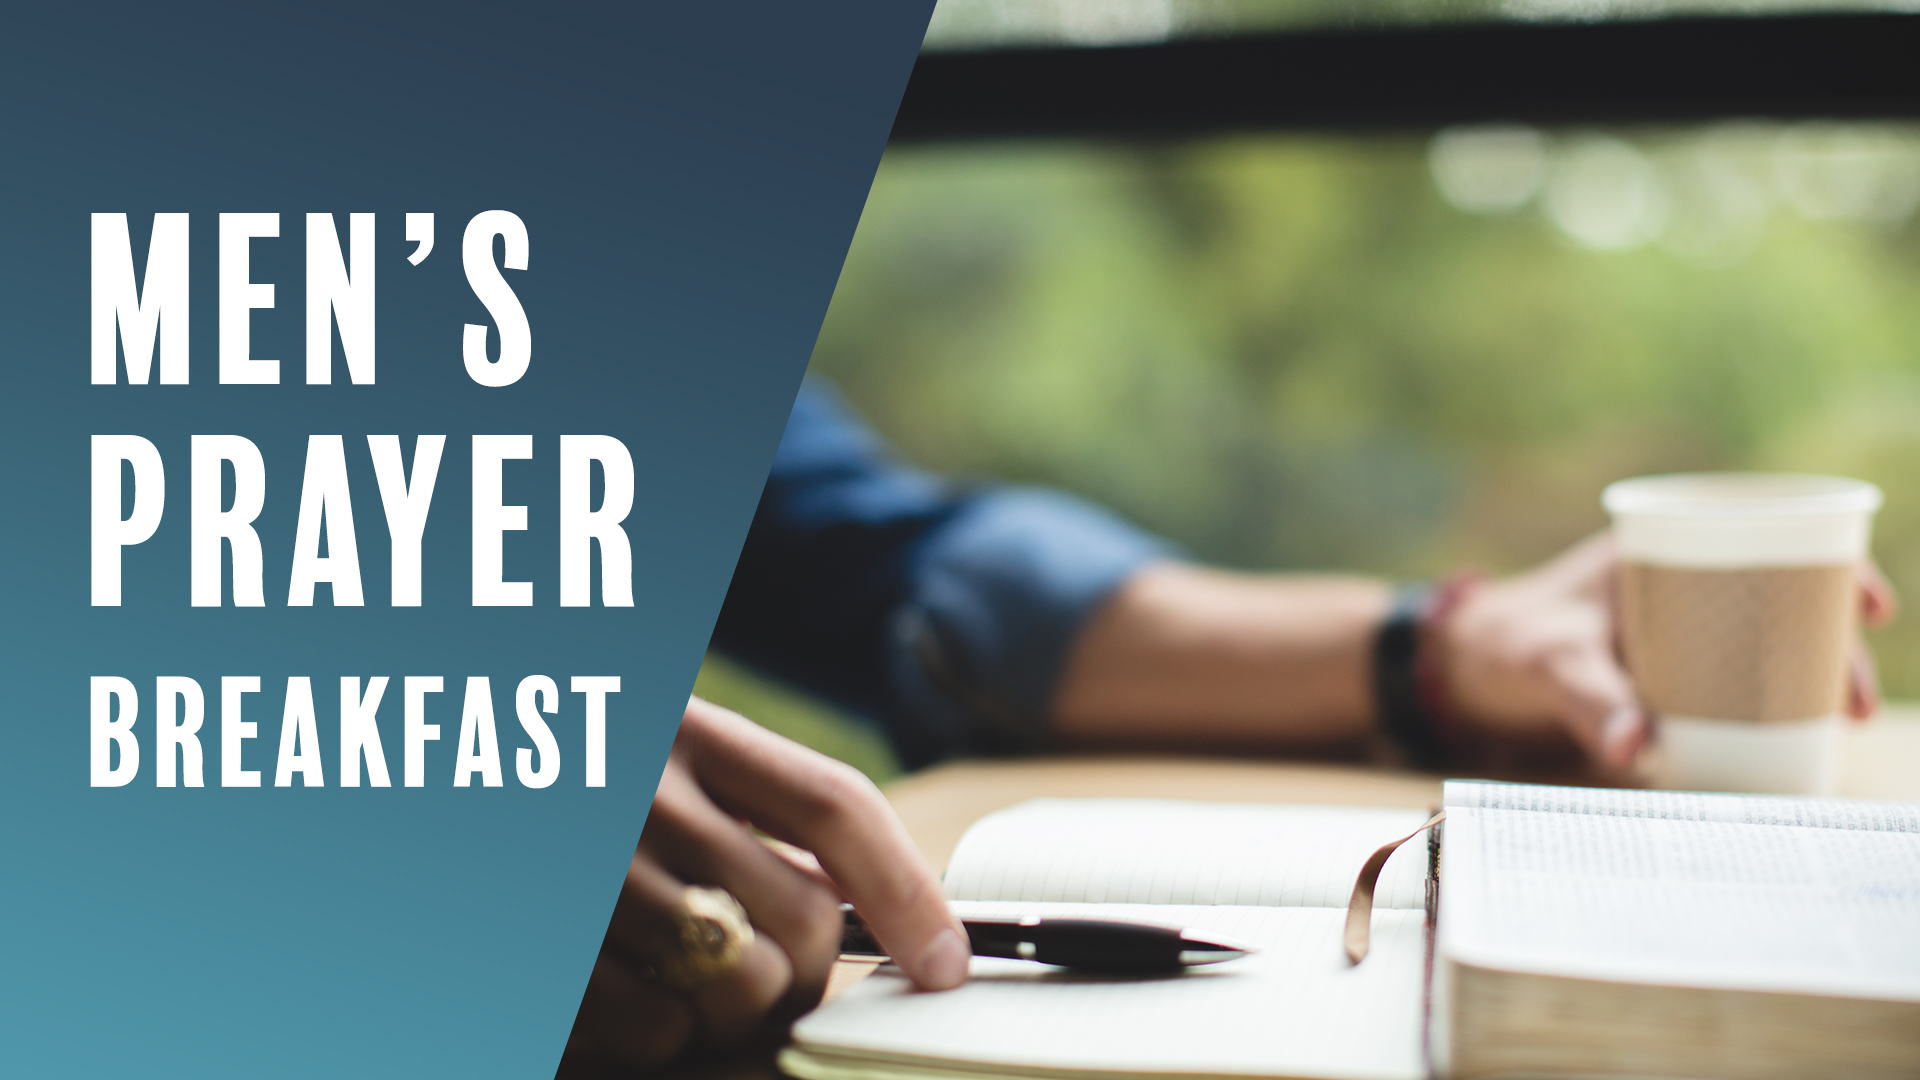 Men's Prayer Breakfast - March 10th